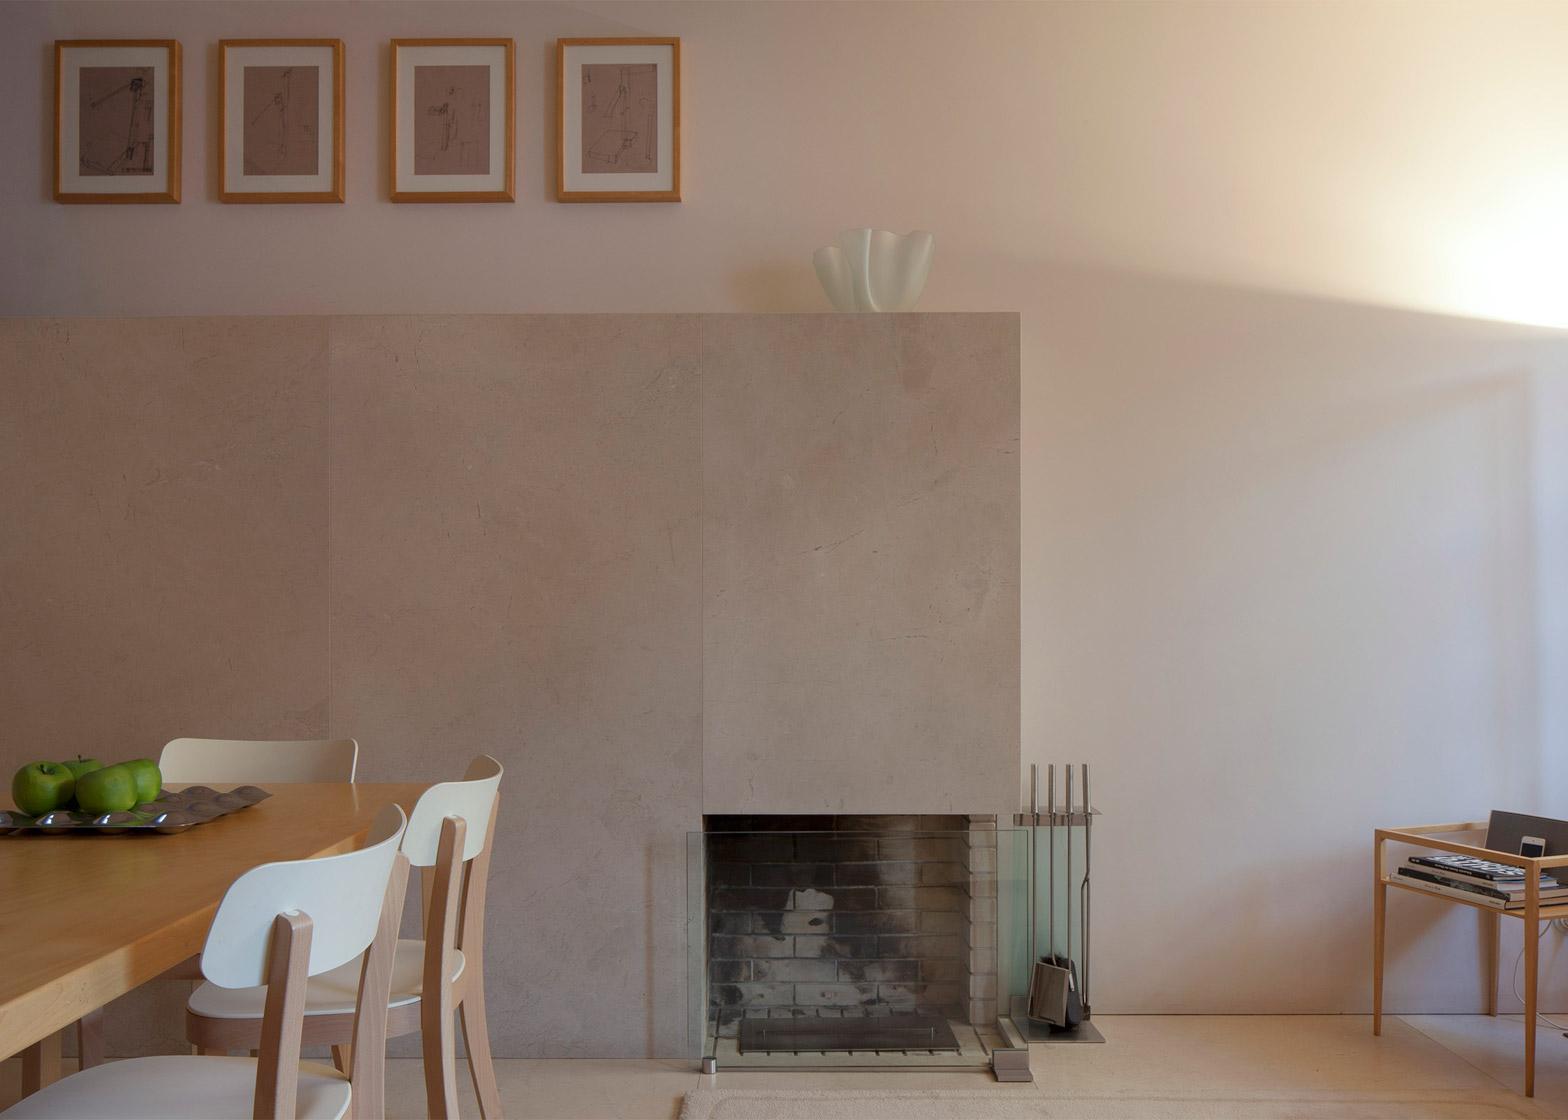 Architecture-courtyard-design-studia-interiors-osnovadesign-osnova-poltava-03